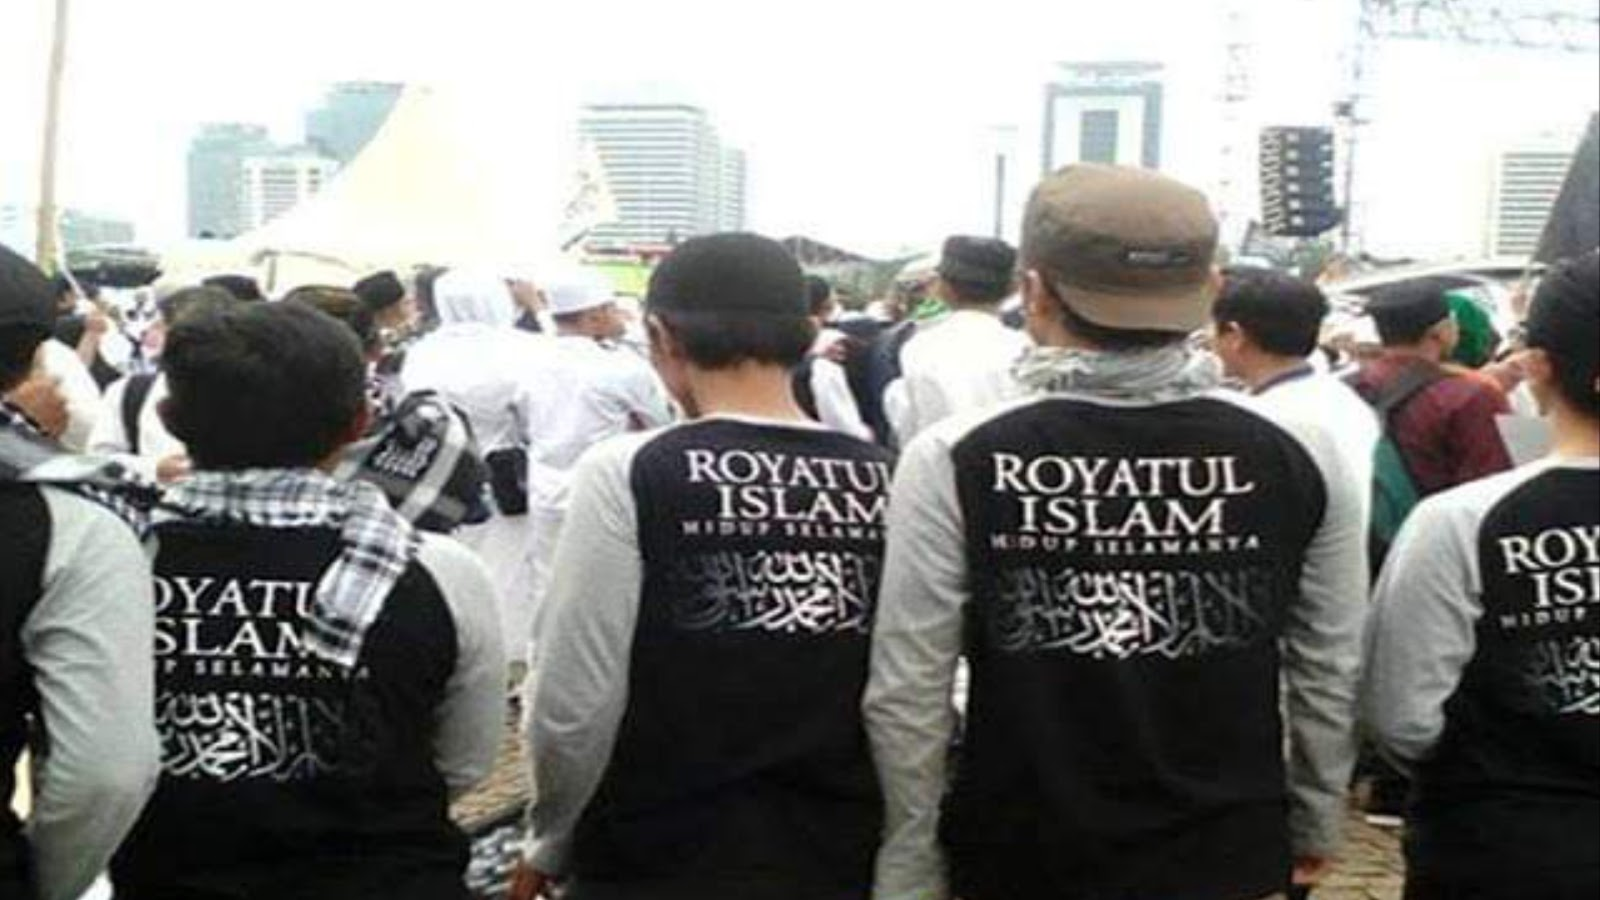 HTI Diduga Sudah Bereinkarnasi, di Jombang Dideteksi Bernama Komunitas Royatul Islam